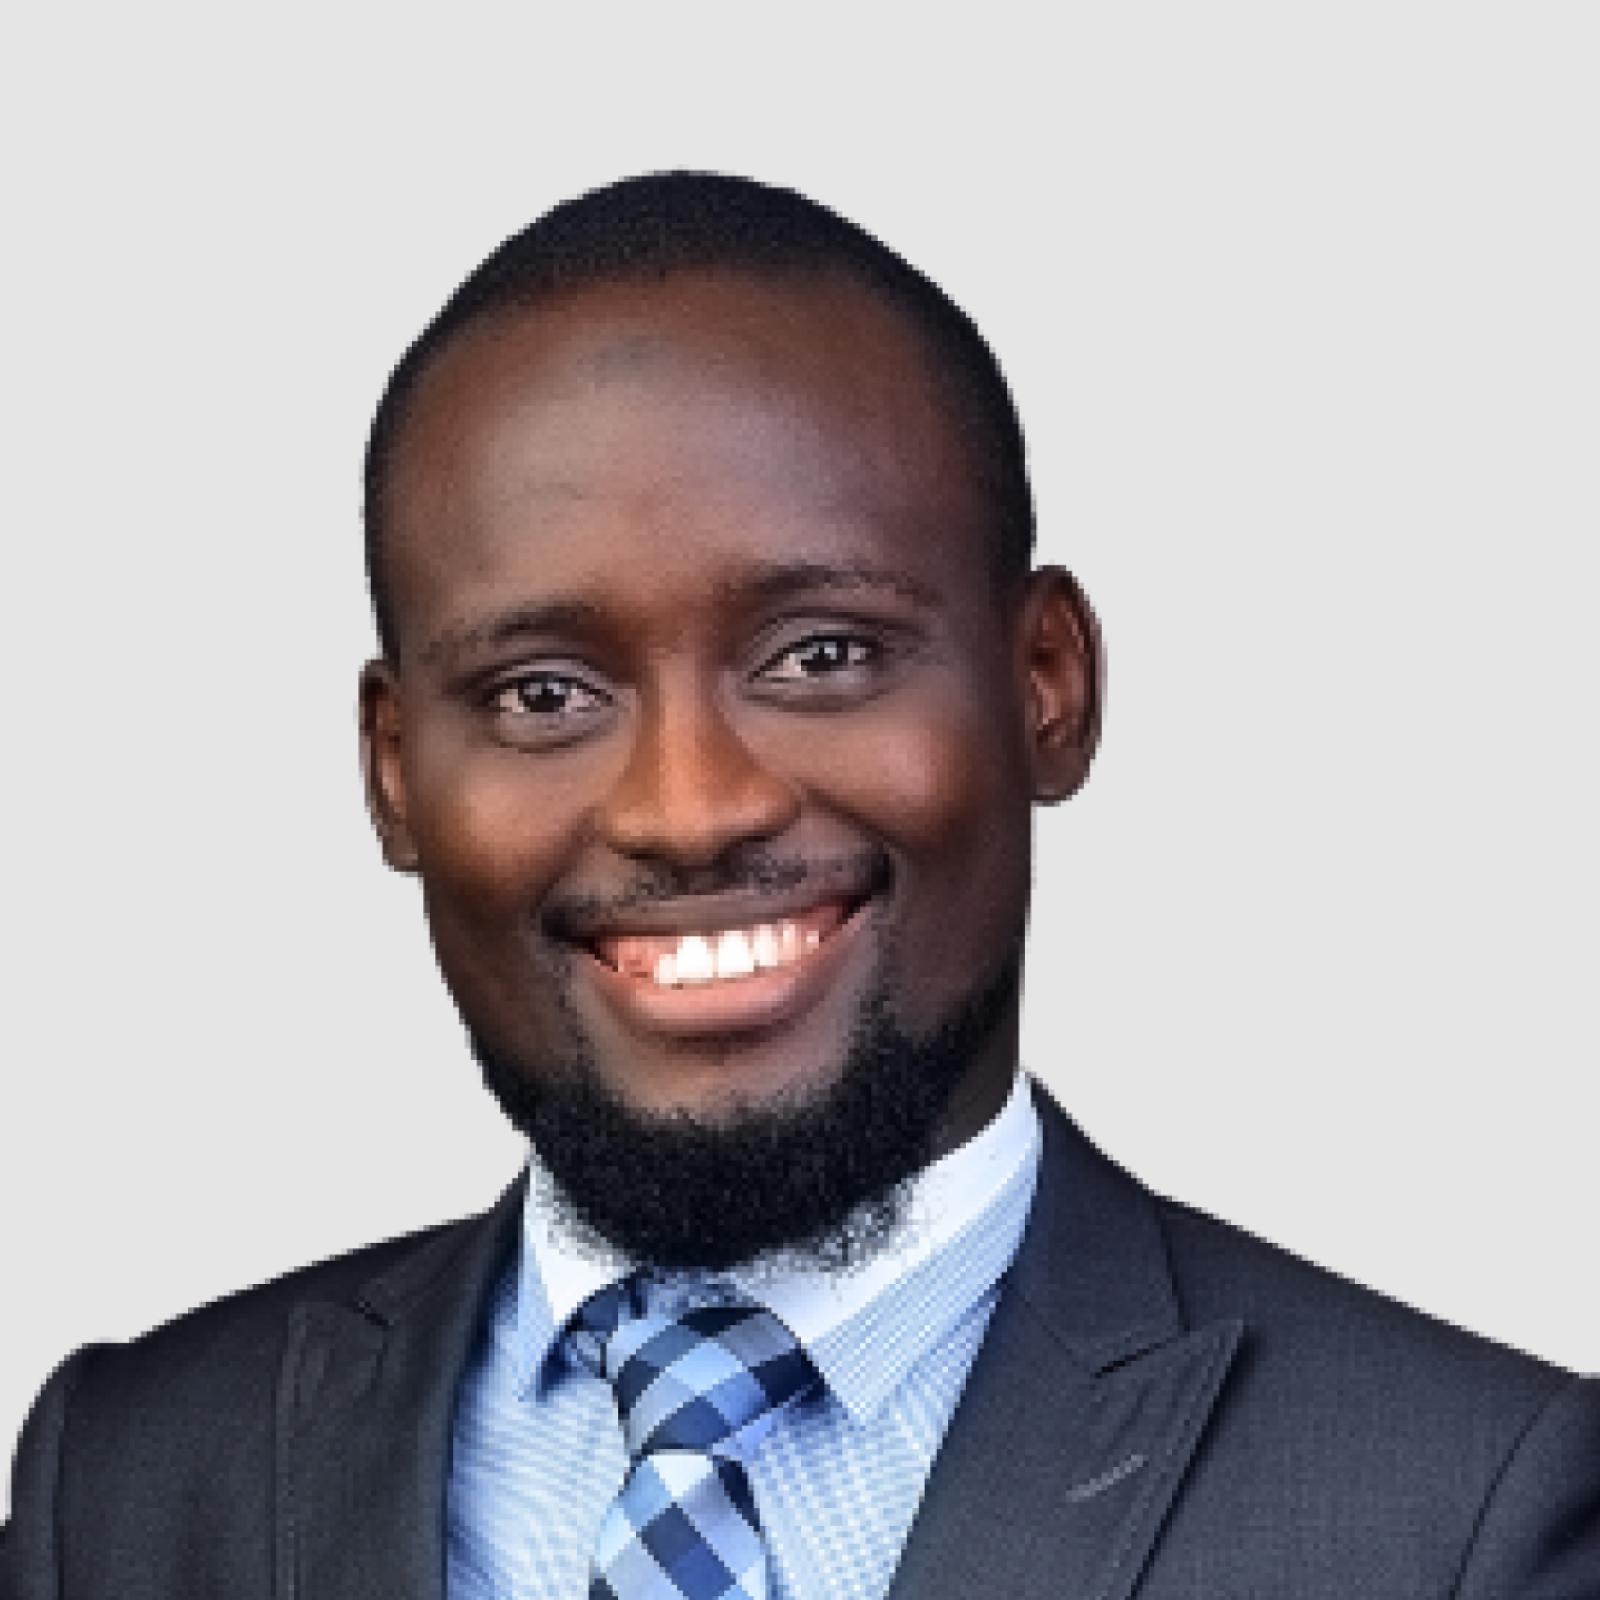 https://devafrique.com/wp-content/uploads/2021/07/Saheed_Saliu__Consultant_-_Nigeria_-removebg-preview.png